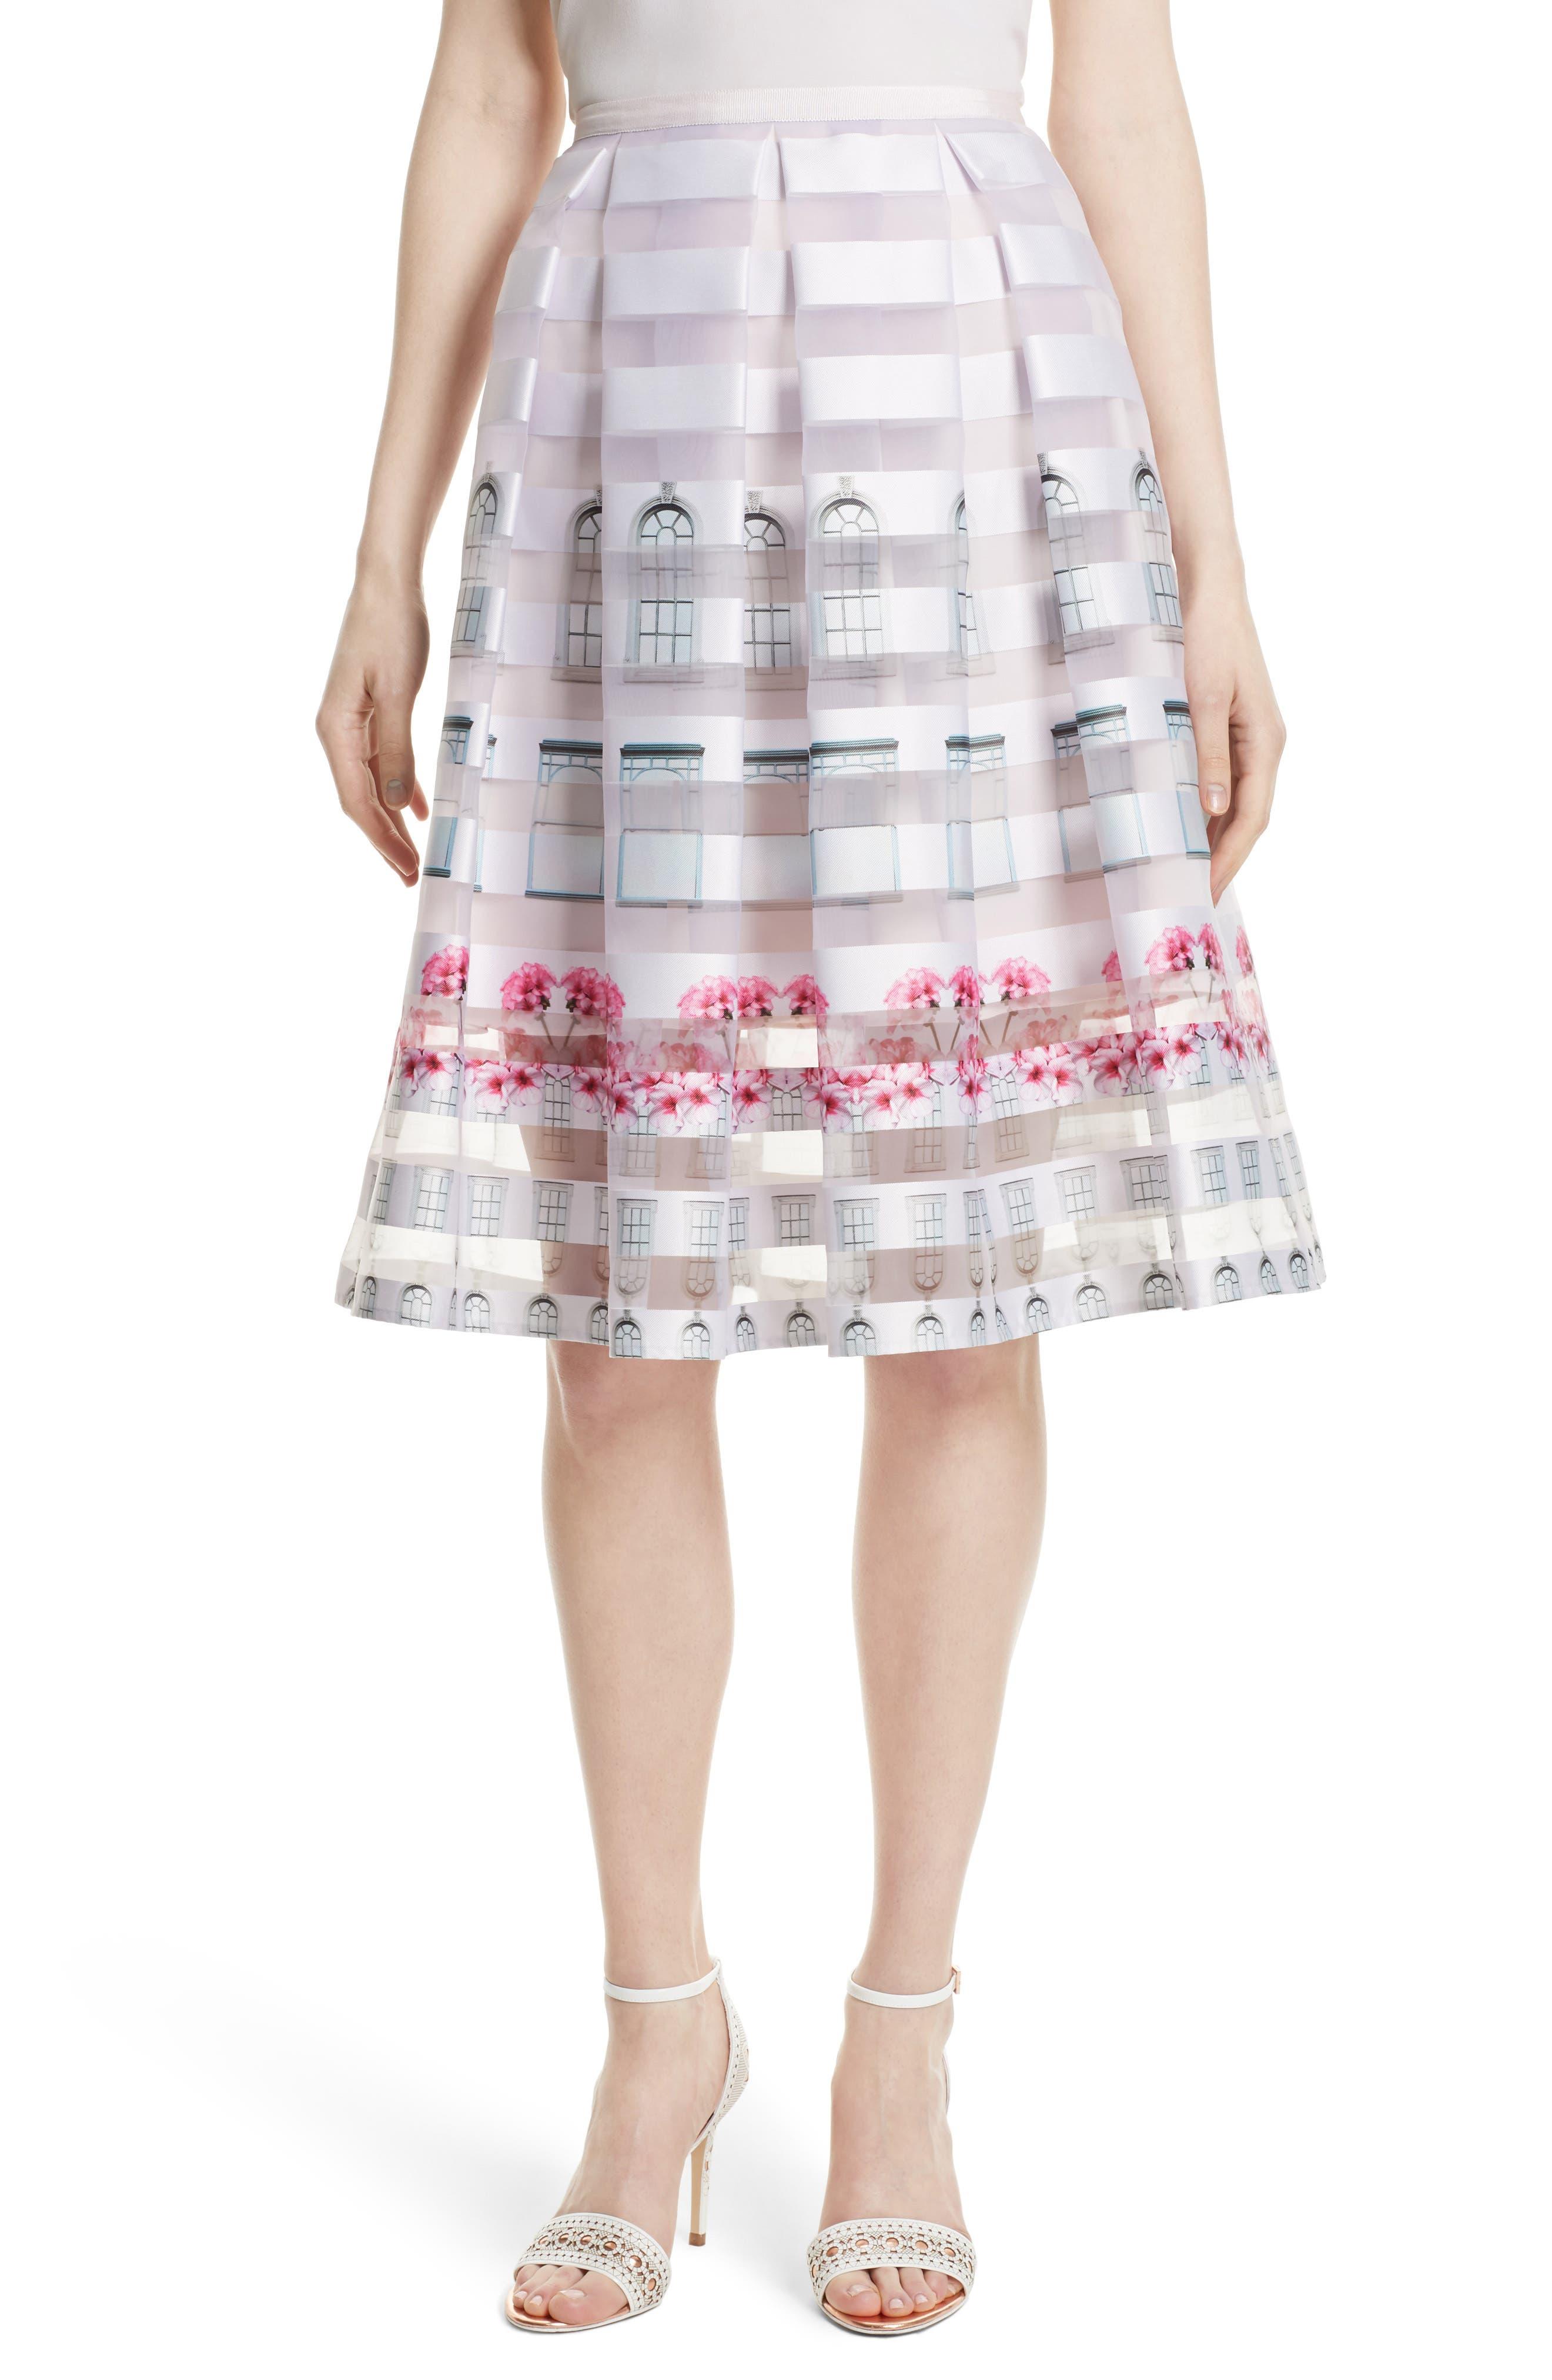 TED BAKER LONDON Niica Midi Skirt, Main, color, 682